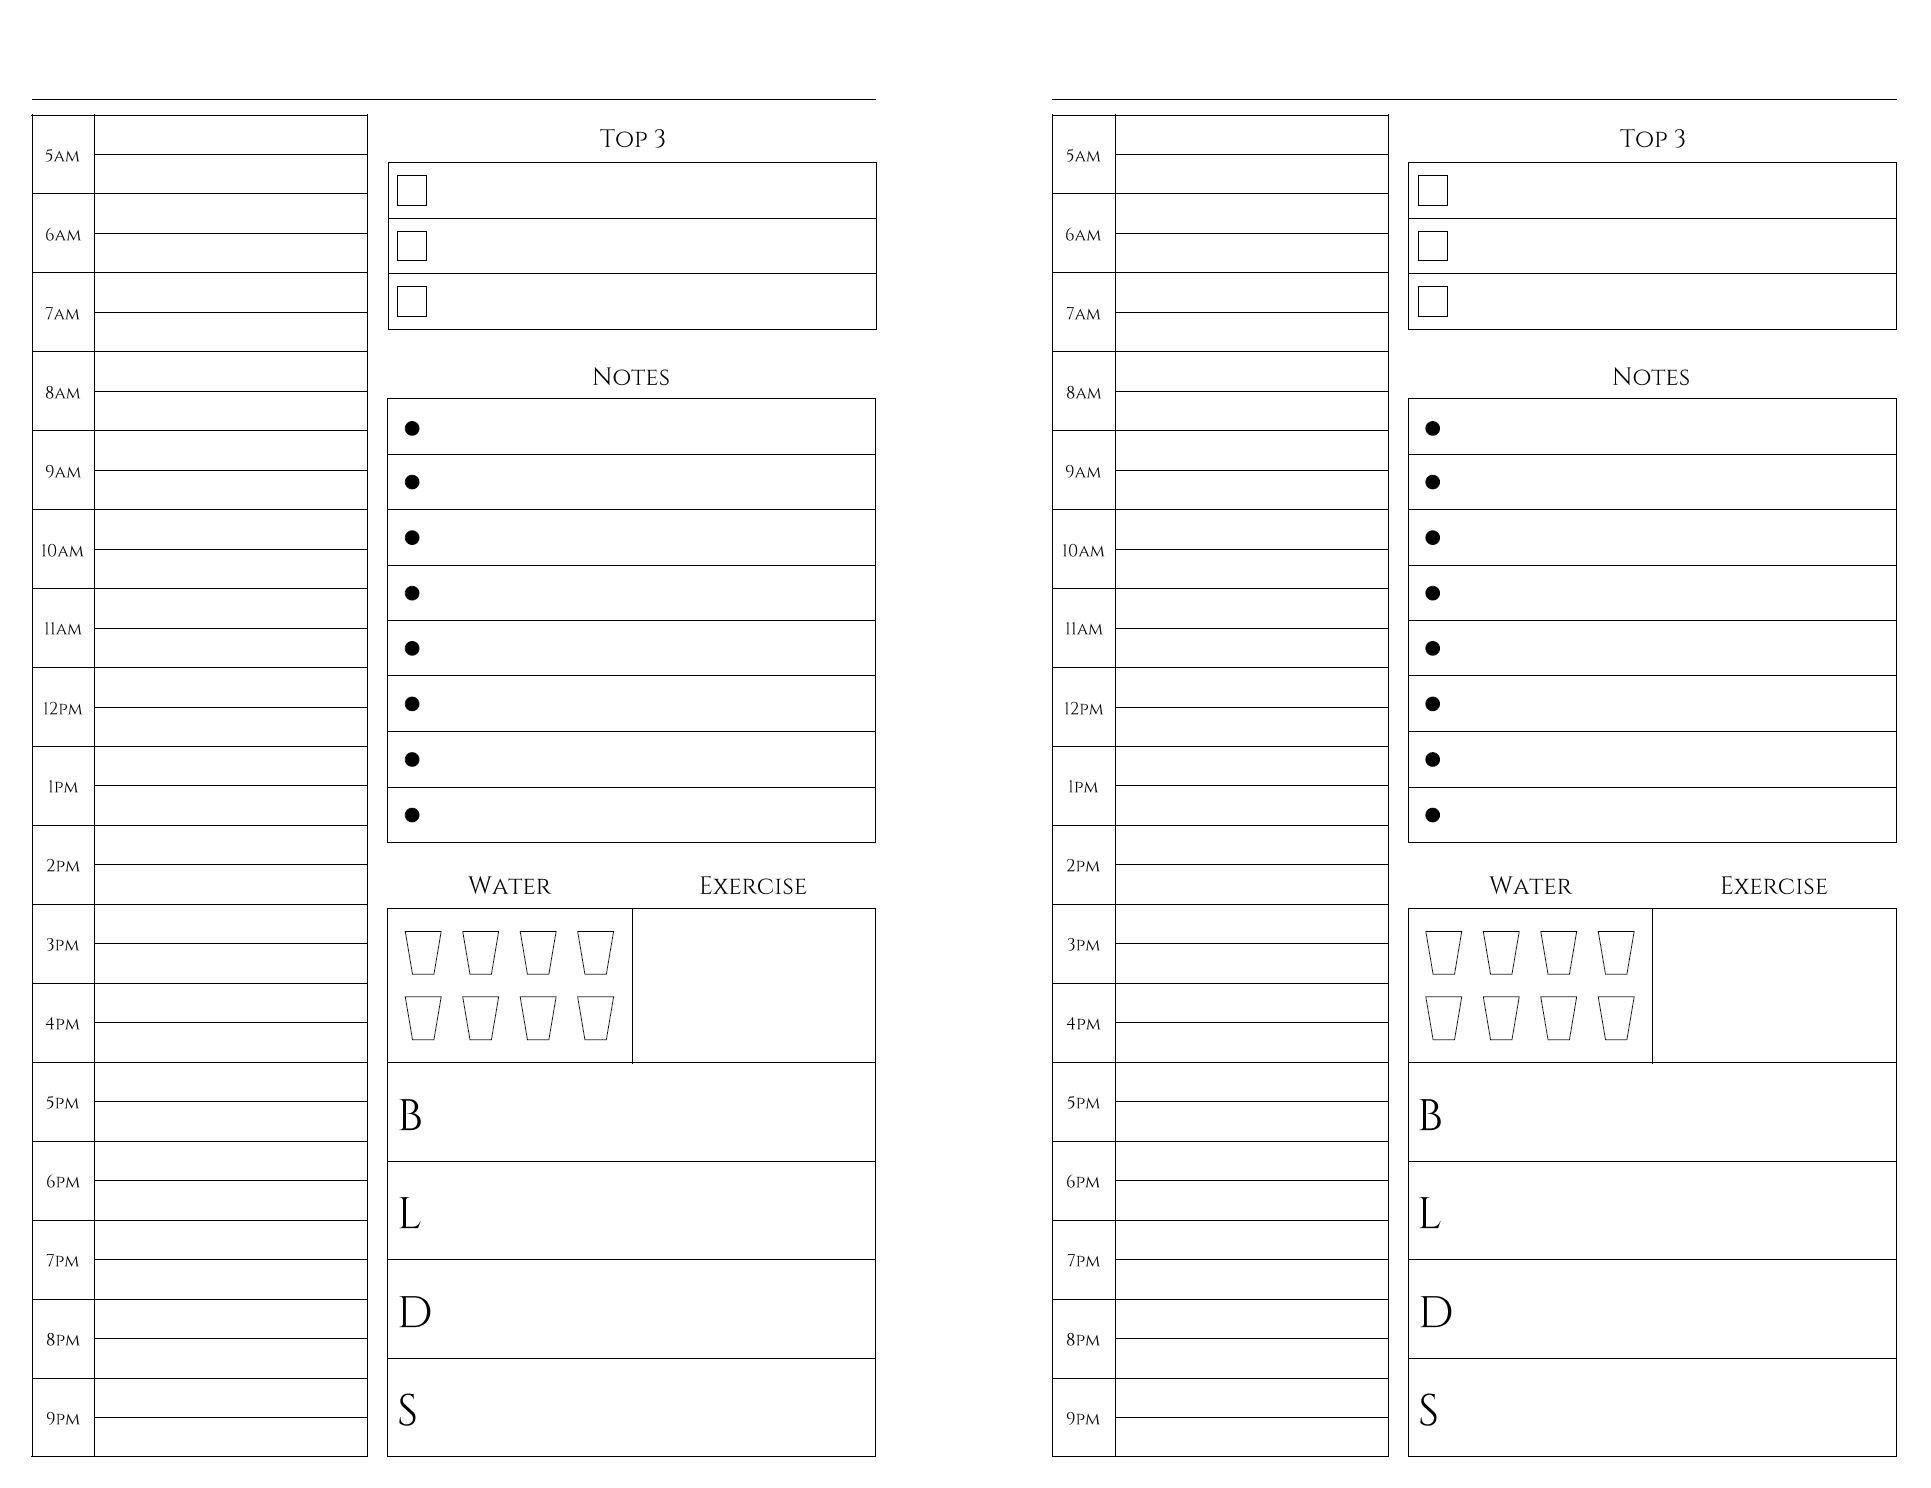 Free Printables | Weekly Planner Printable, Daily Planner Libreoffice 5.5 X 8.5 Calendar